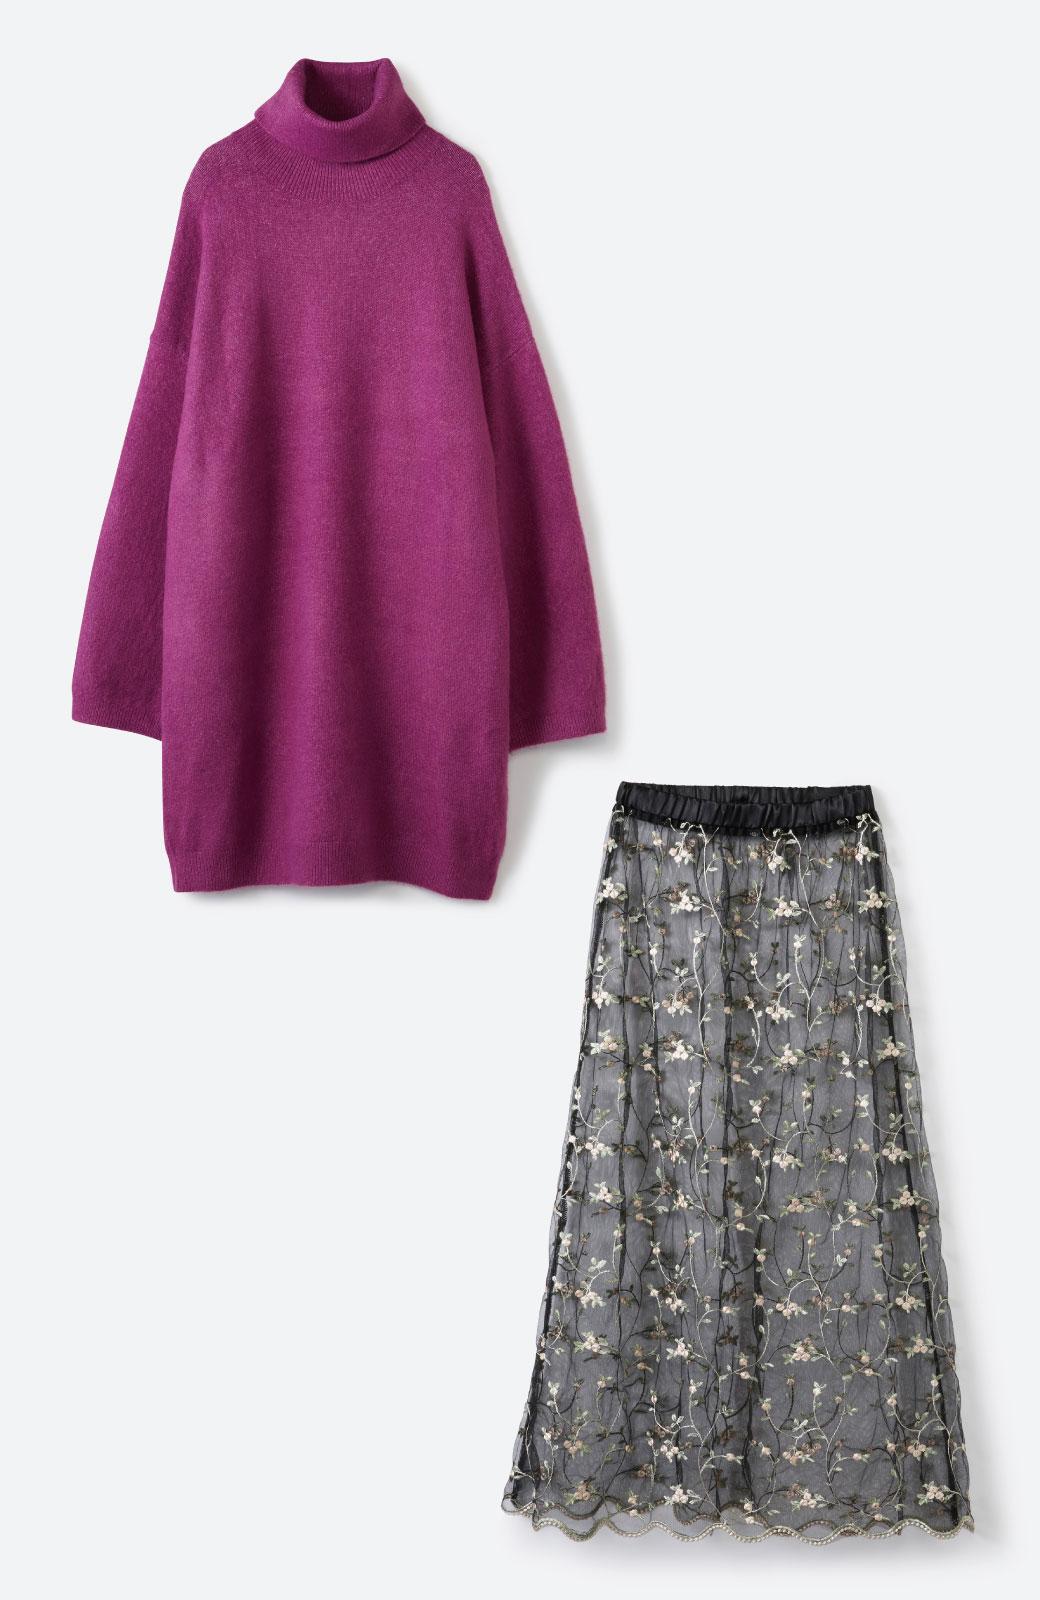 haco! <スザンヌさんコラボ>ラブ&ピースプロジェクト ニットワンピ&チュール刺しゅうスカートセット <パープル系その他>の商品写真2